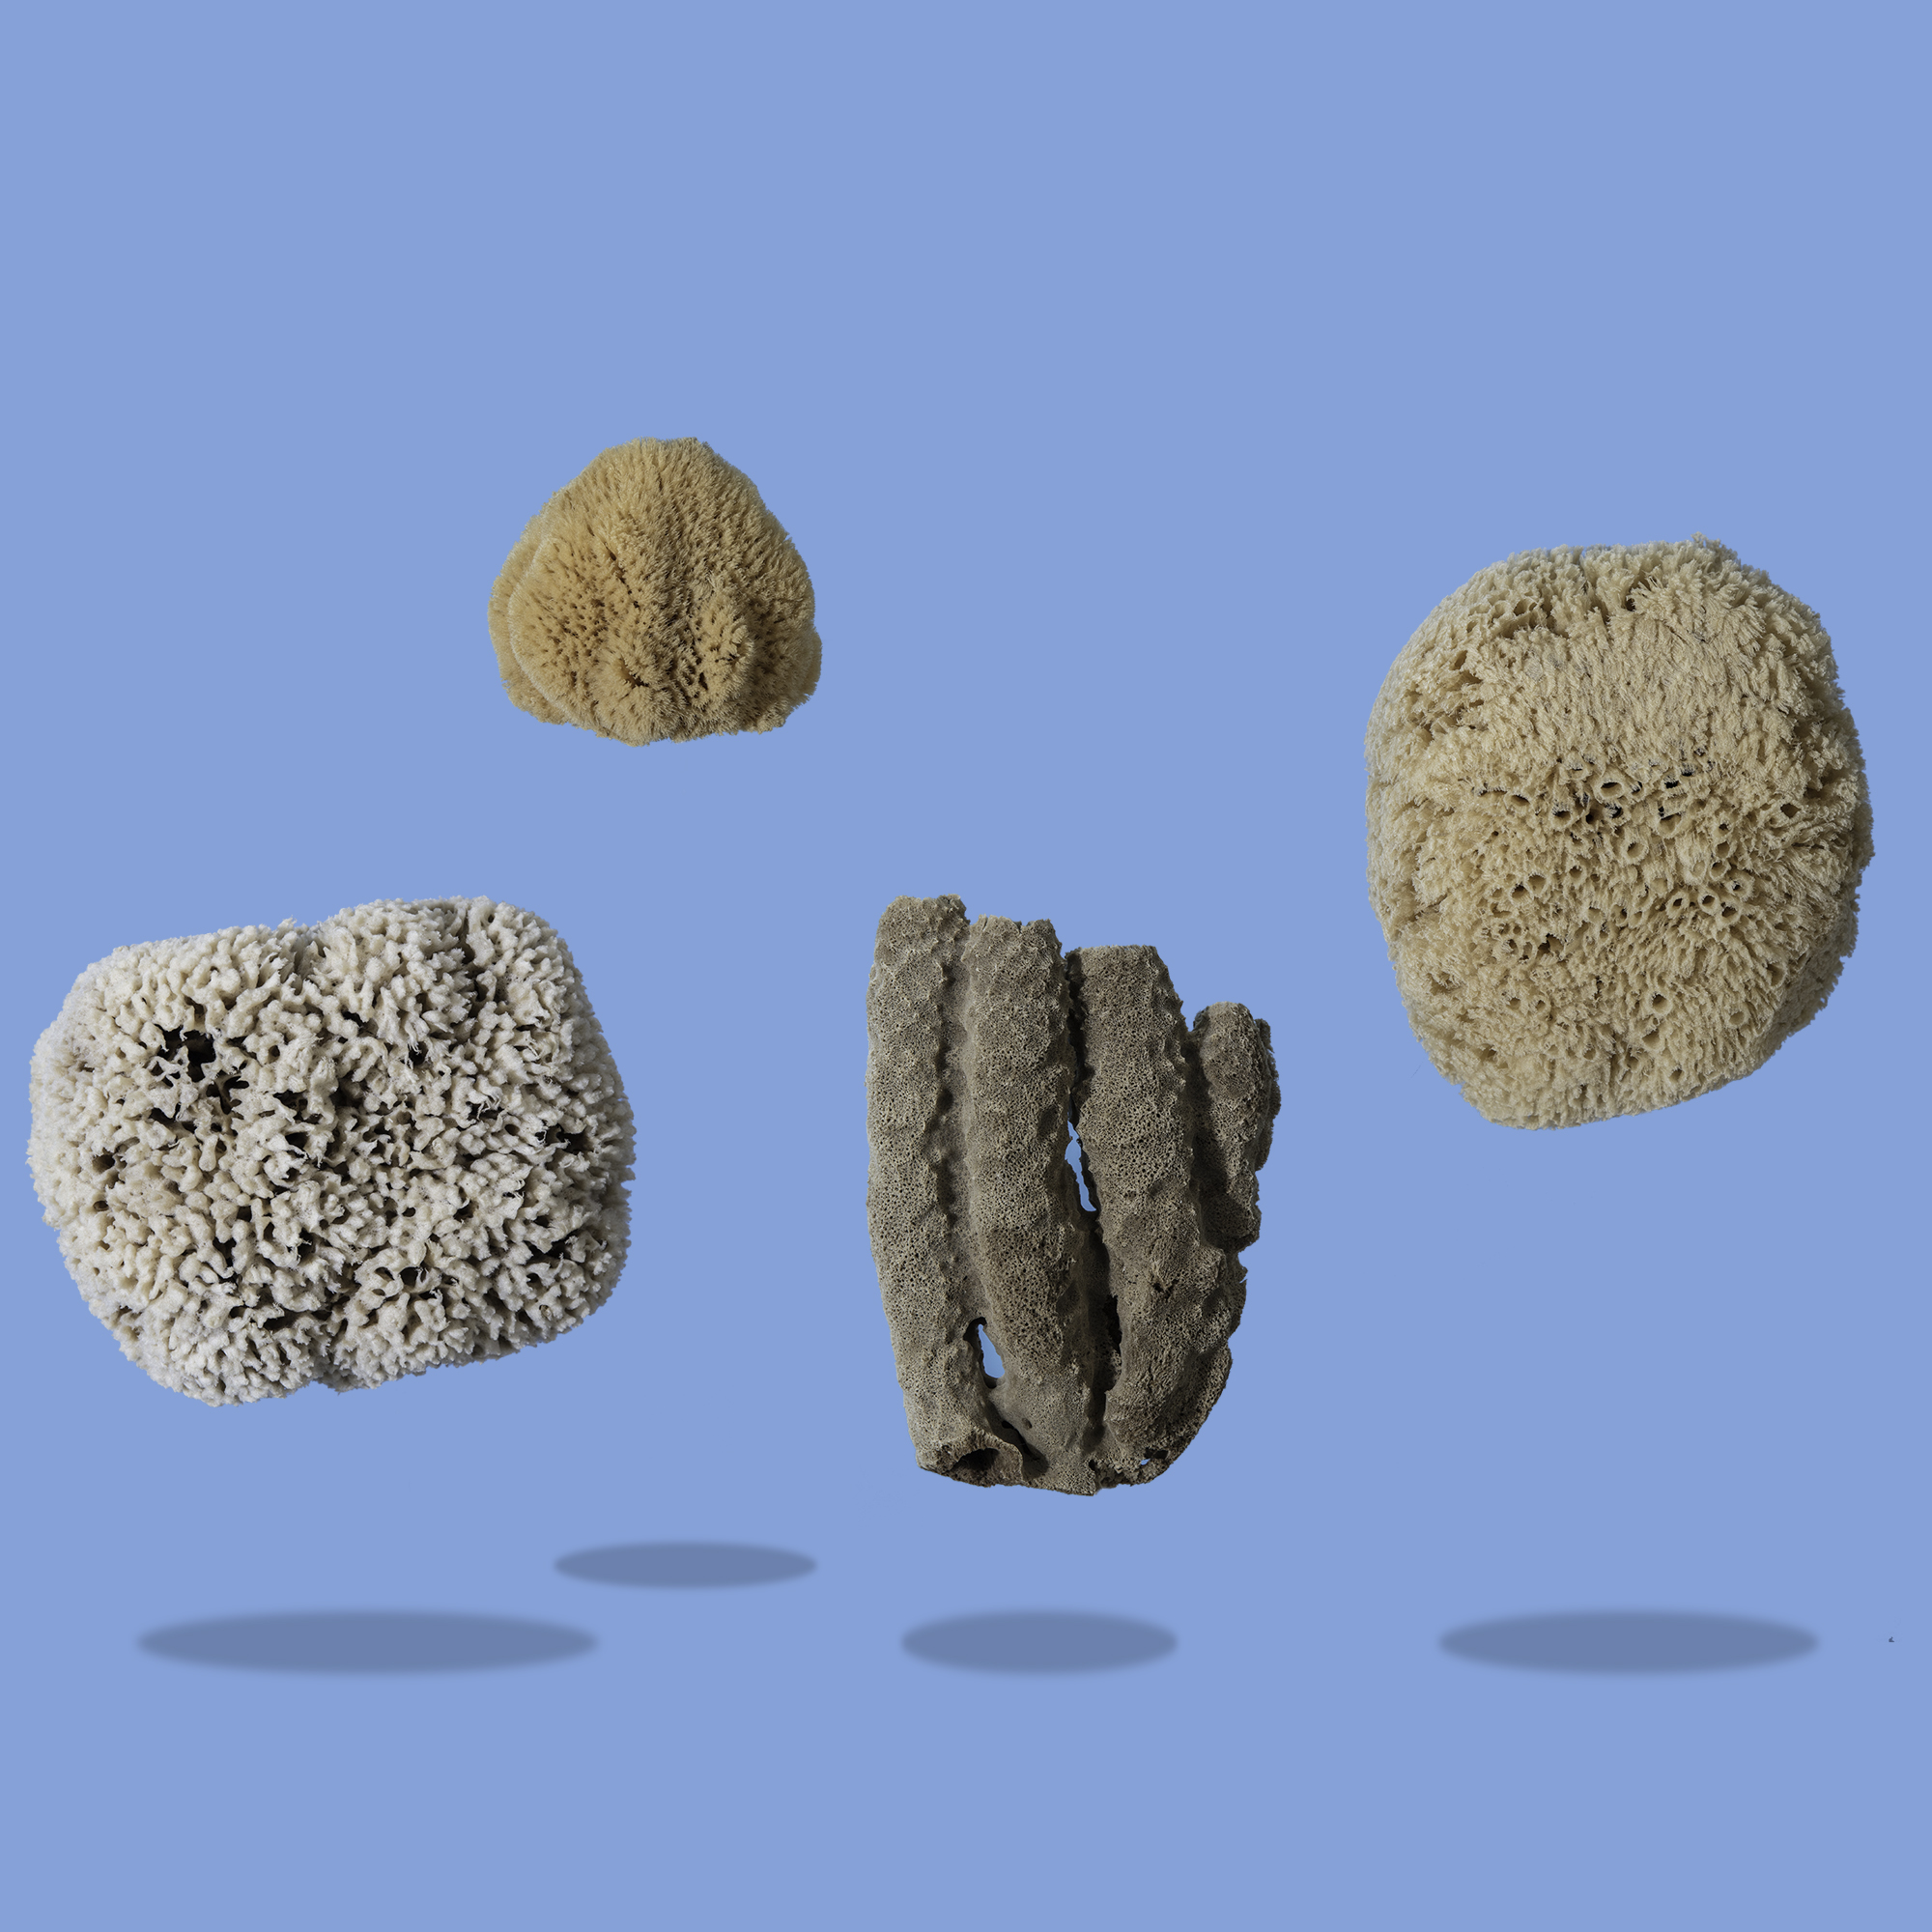 Seep the benefits of Sea Sponges